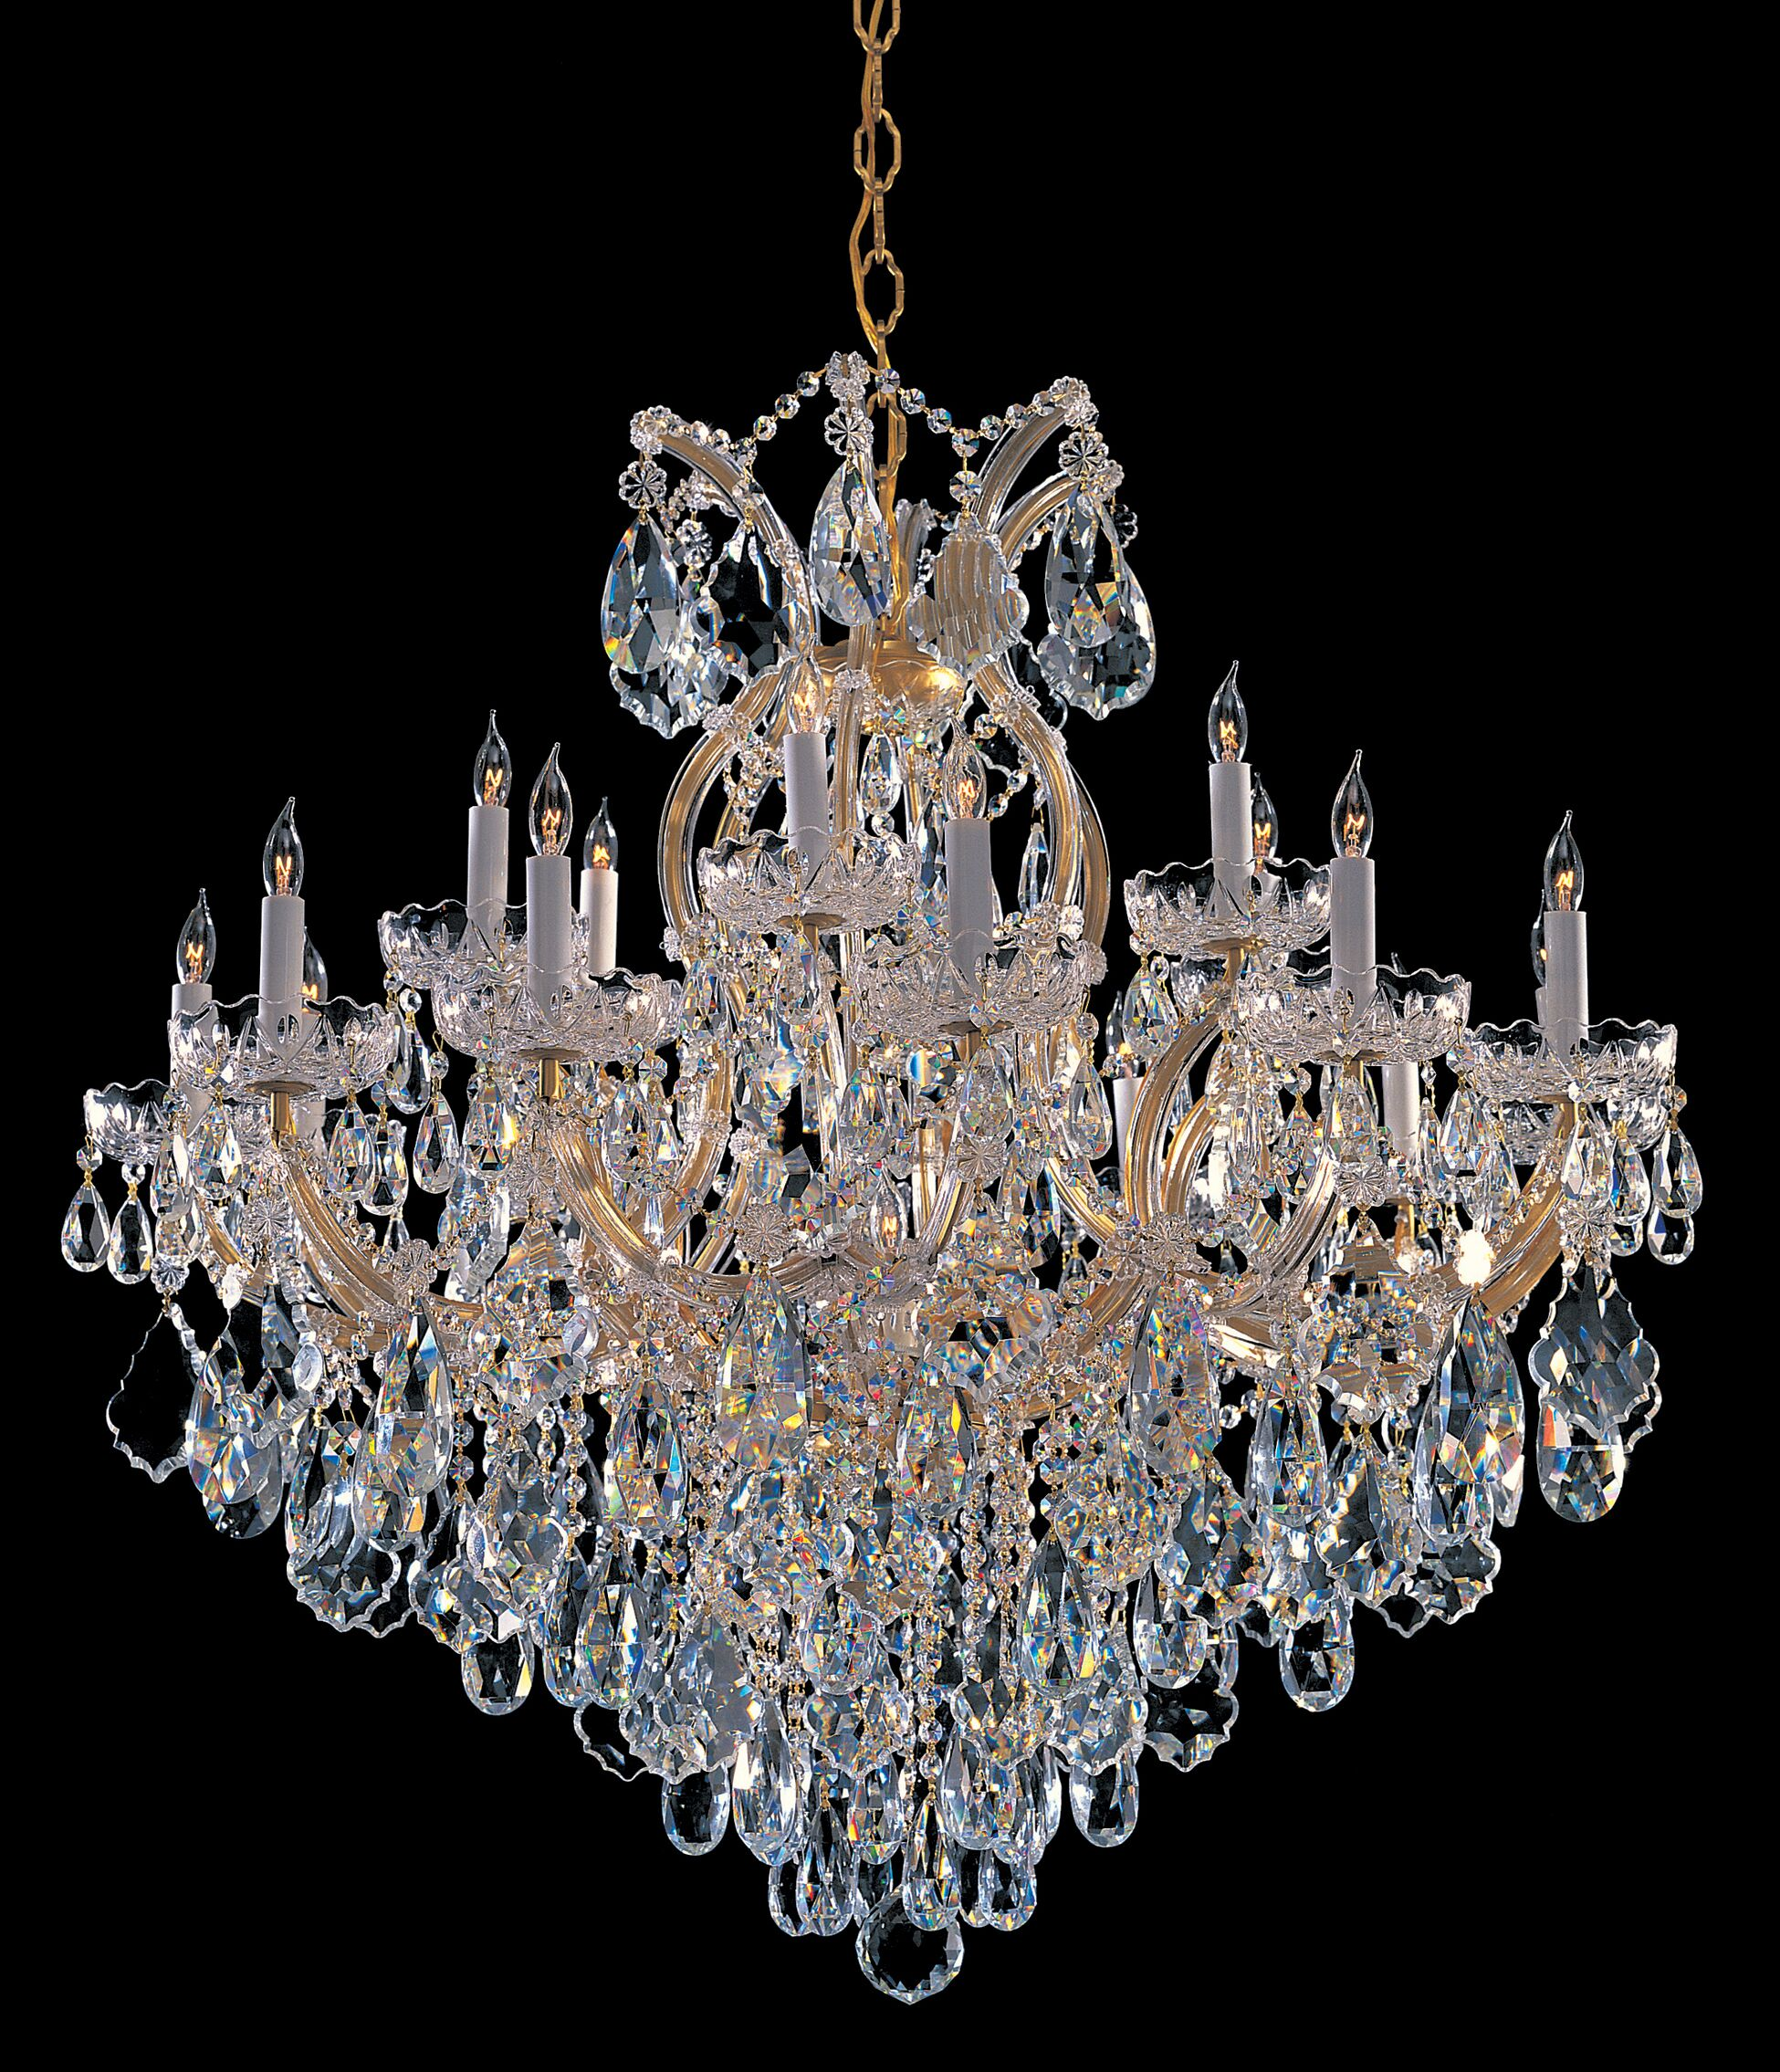 Milan 19-Light Candle Style Chandelier Finish: Gold, Crystal Type: Swarovski Strass